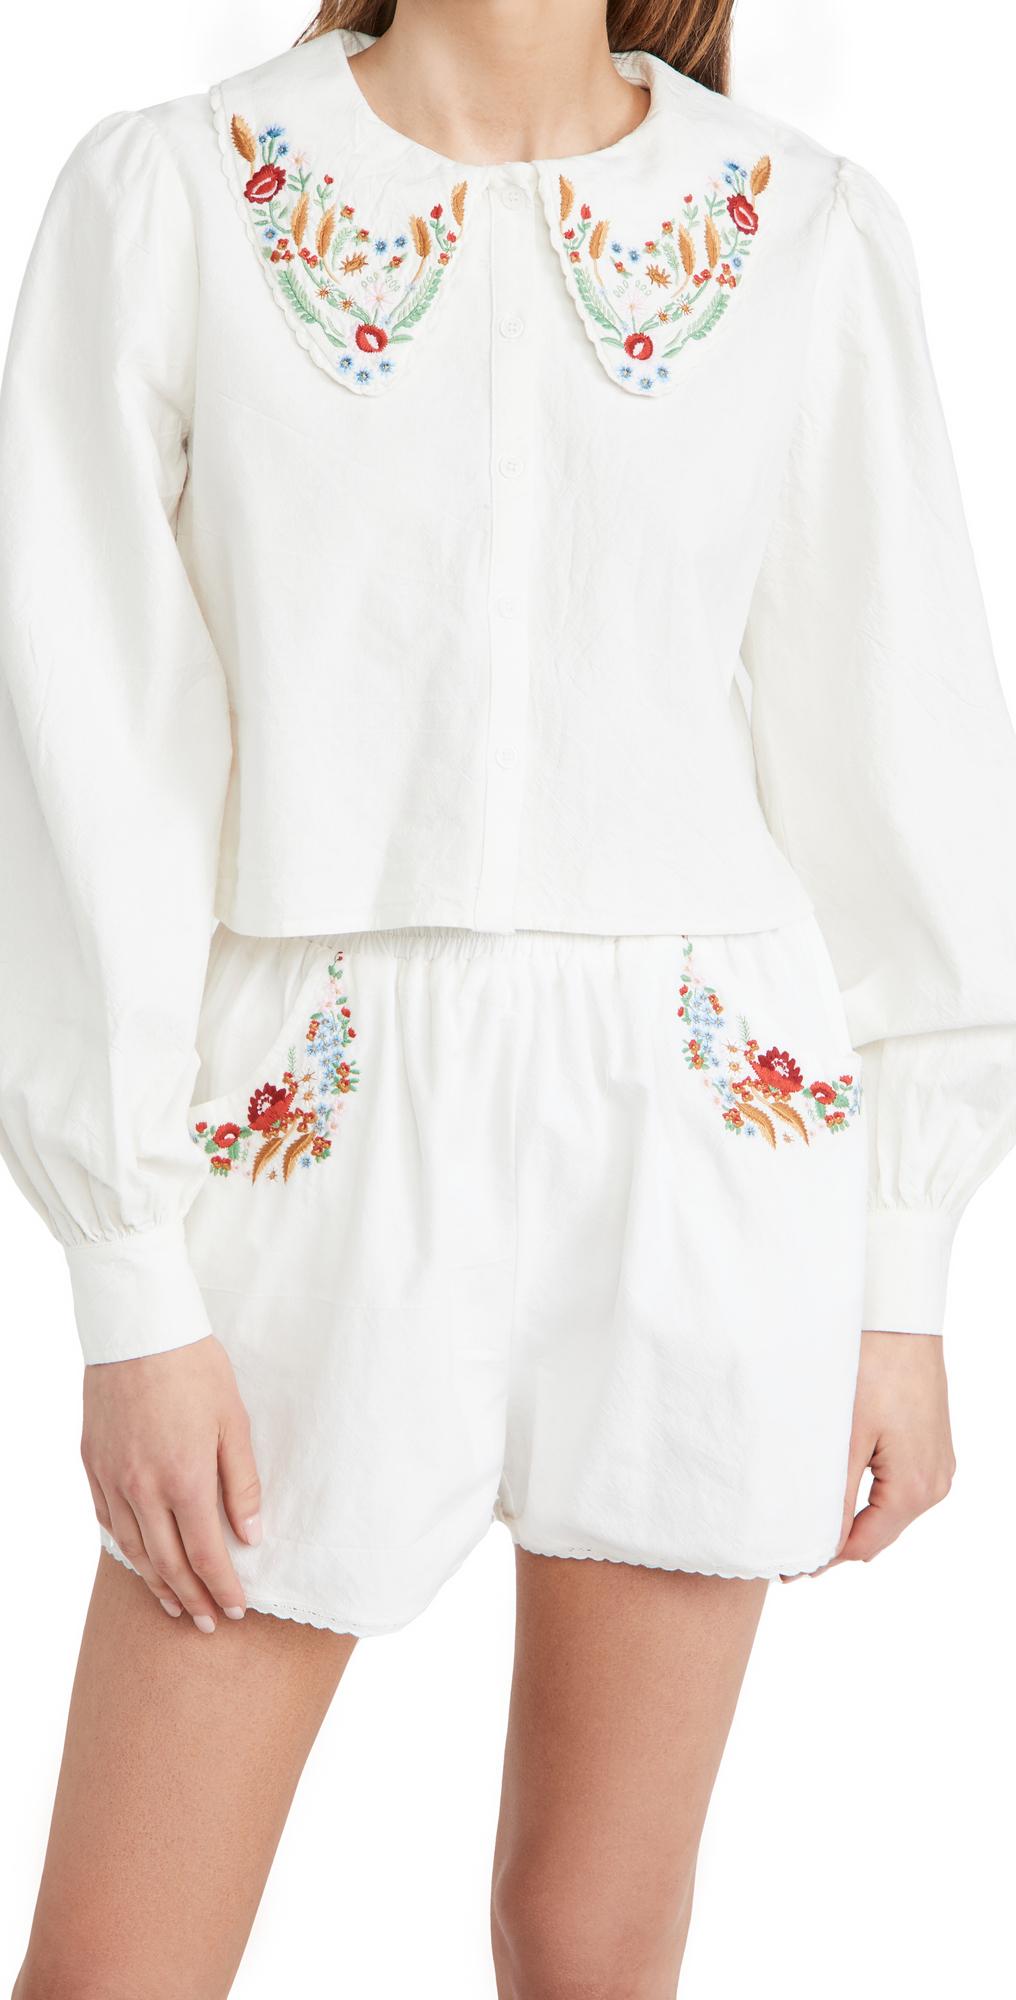 Foxglove Shirt